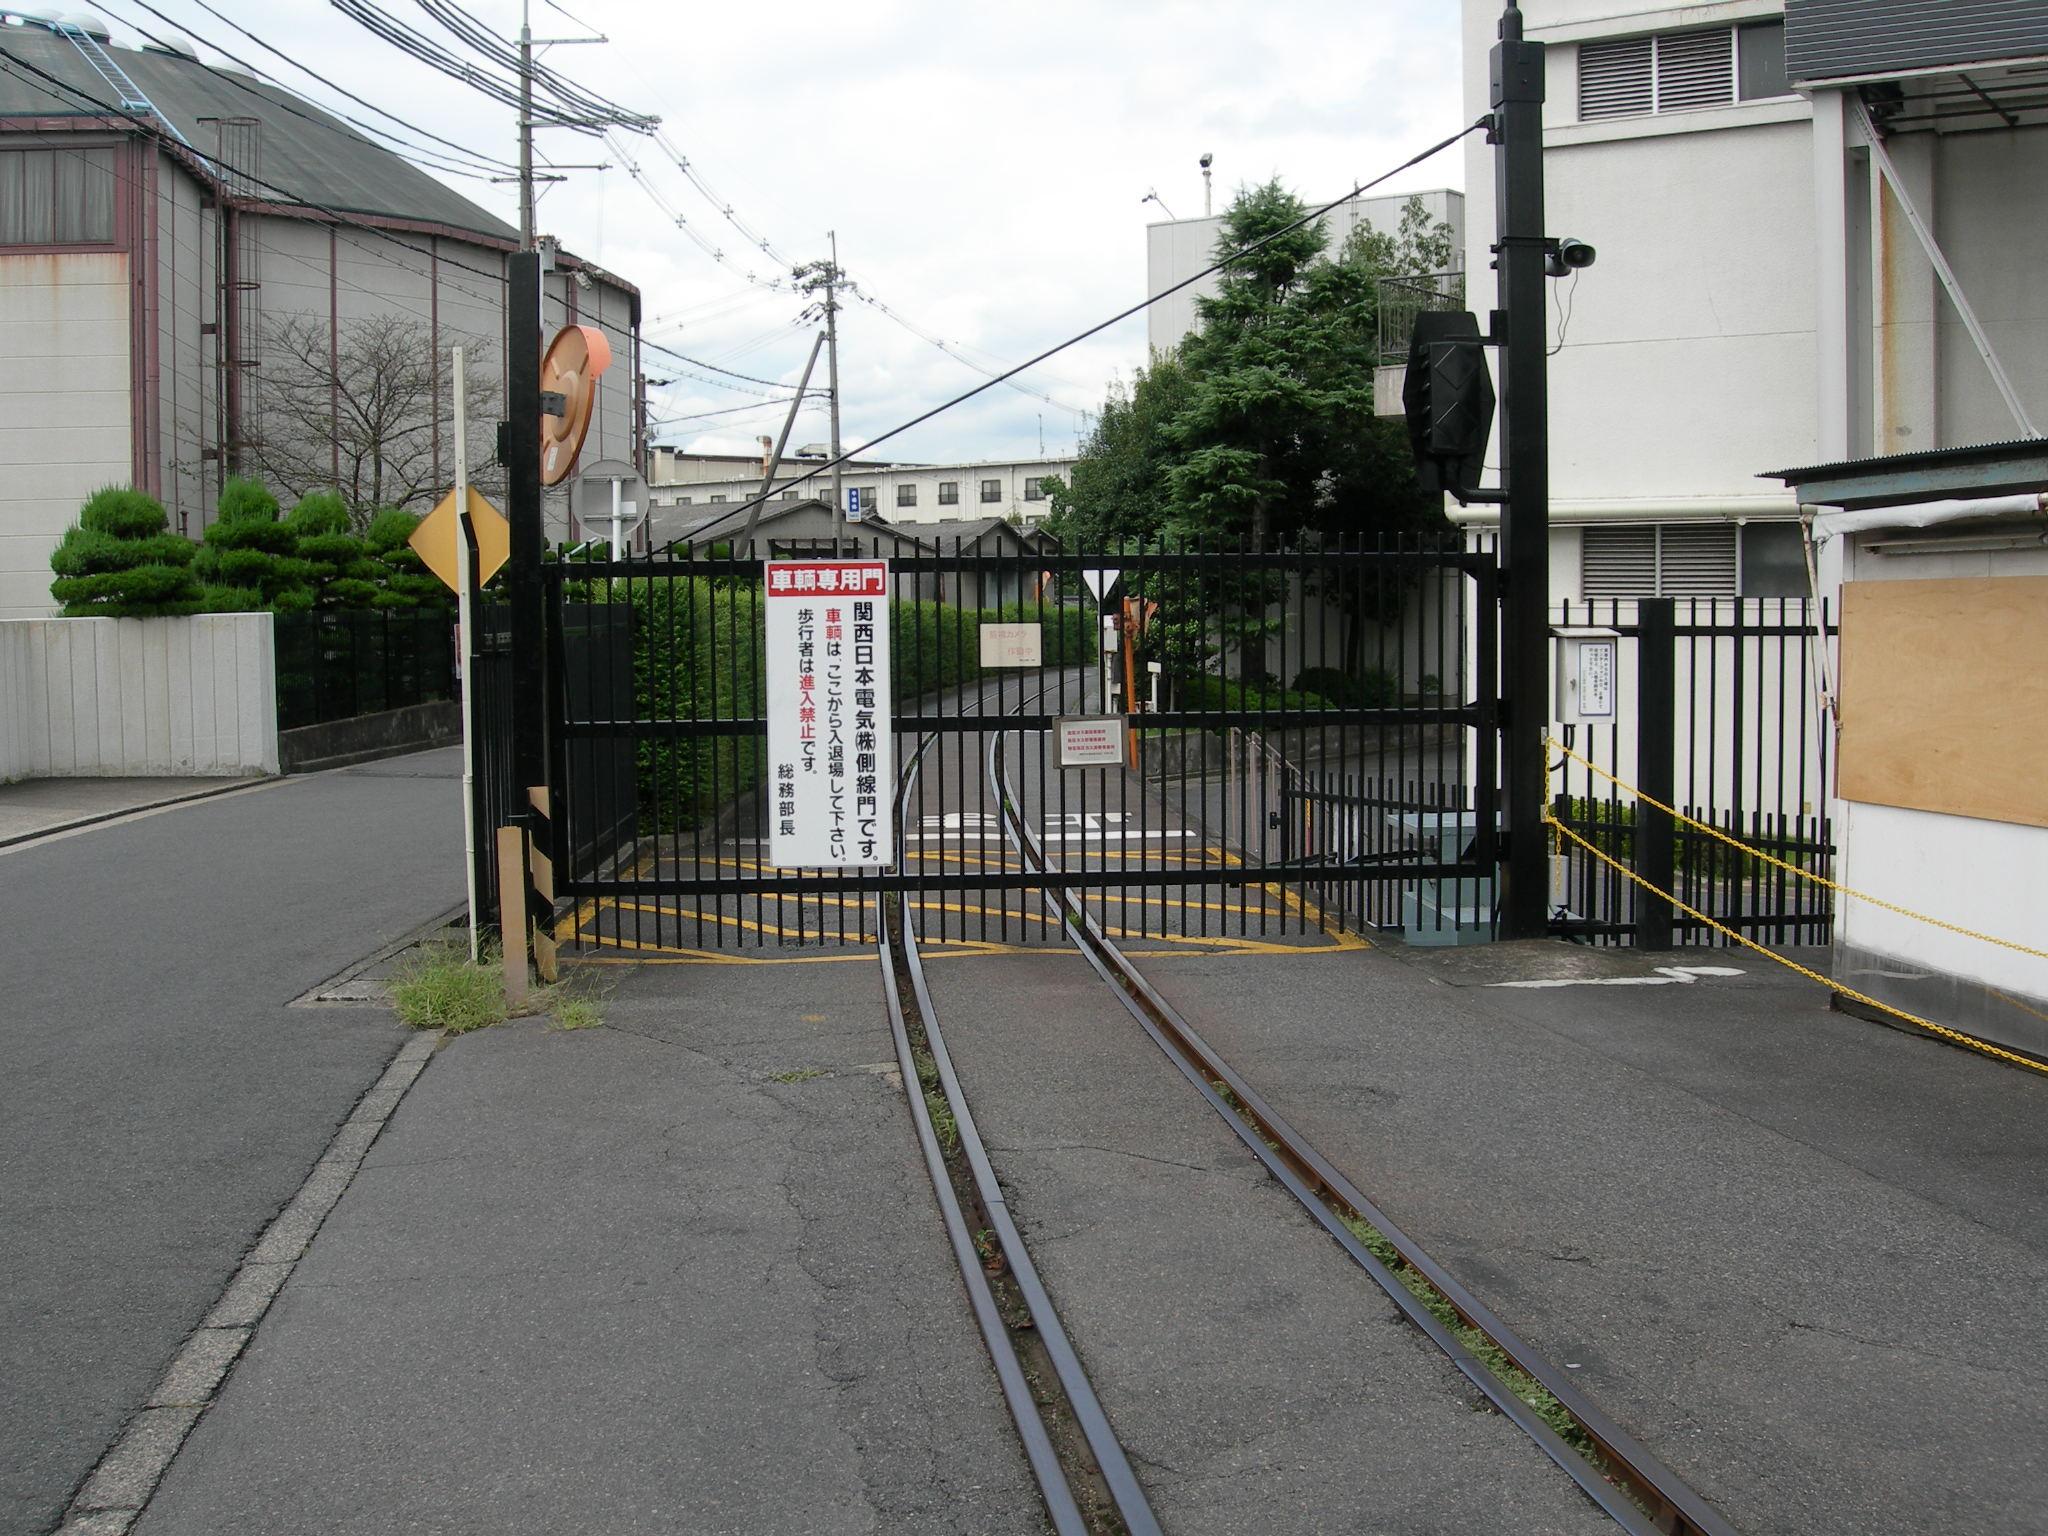 File:Industrial railway from Kansai NEC in Ishiyama DSCN0459 ...